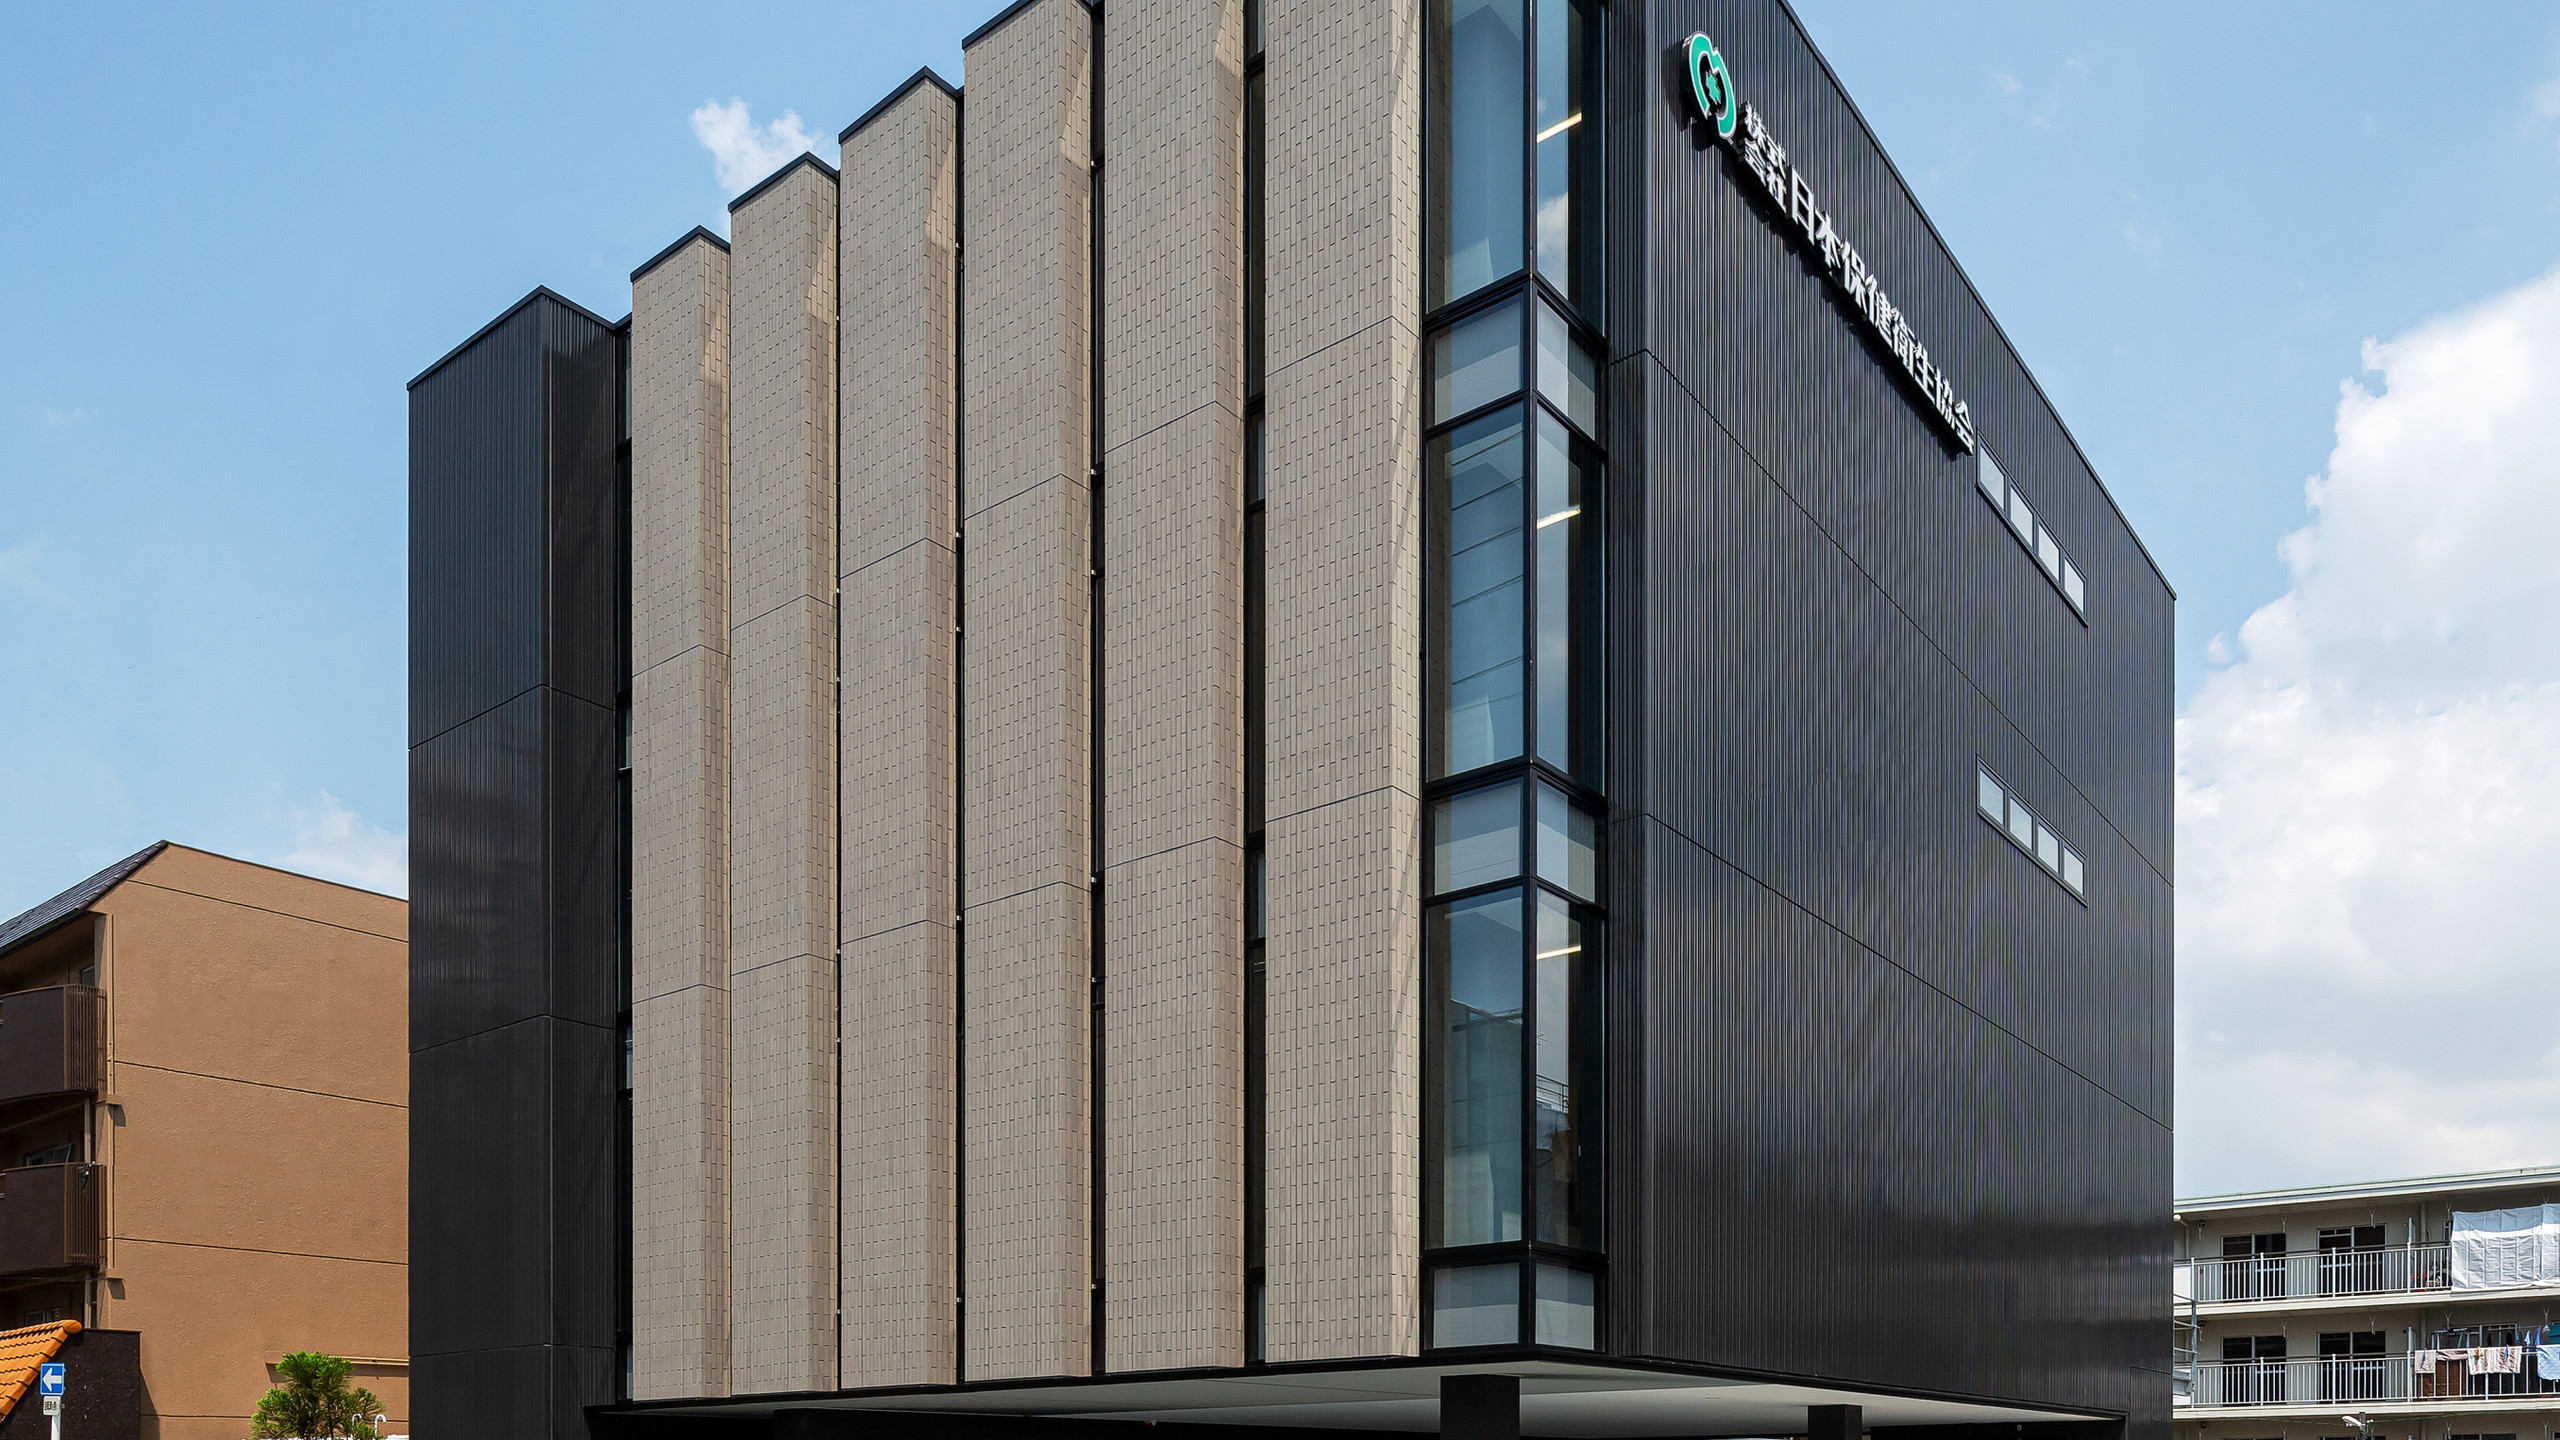 Building exterior 1